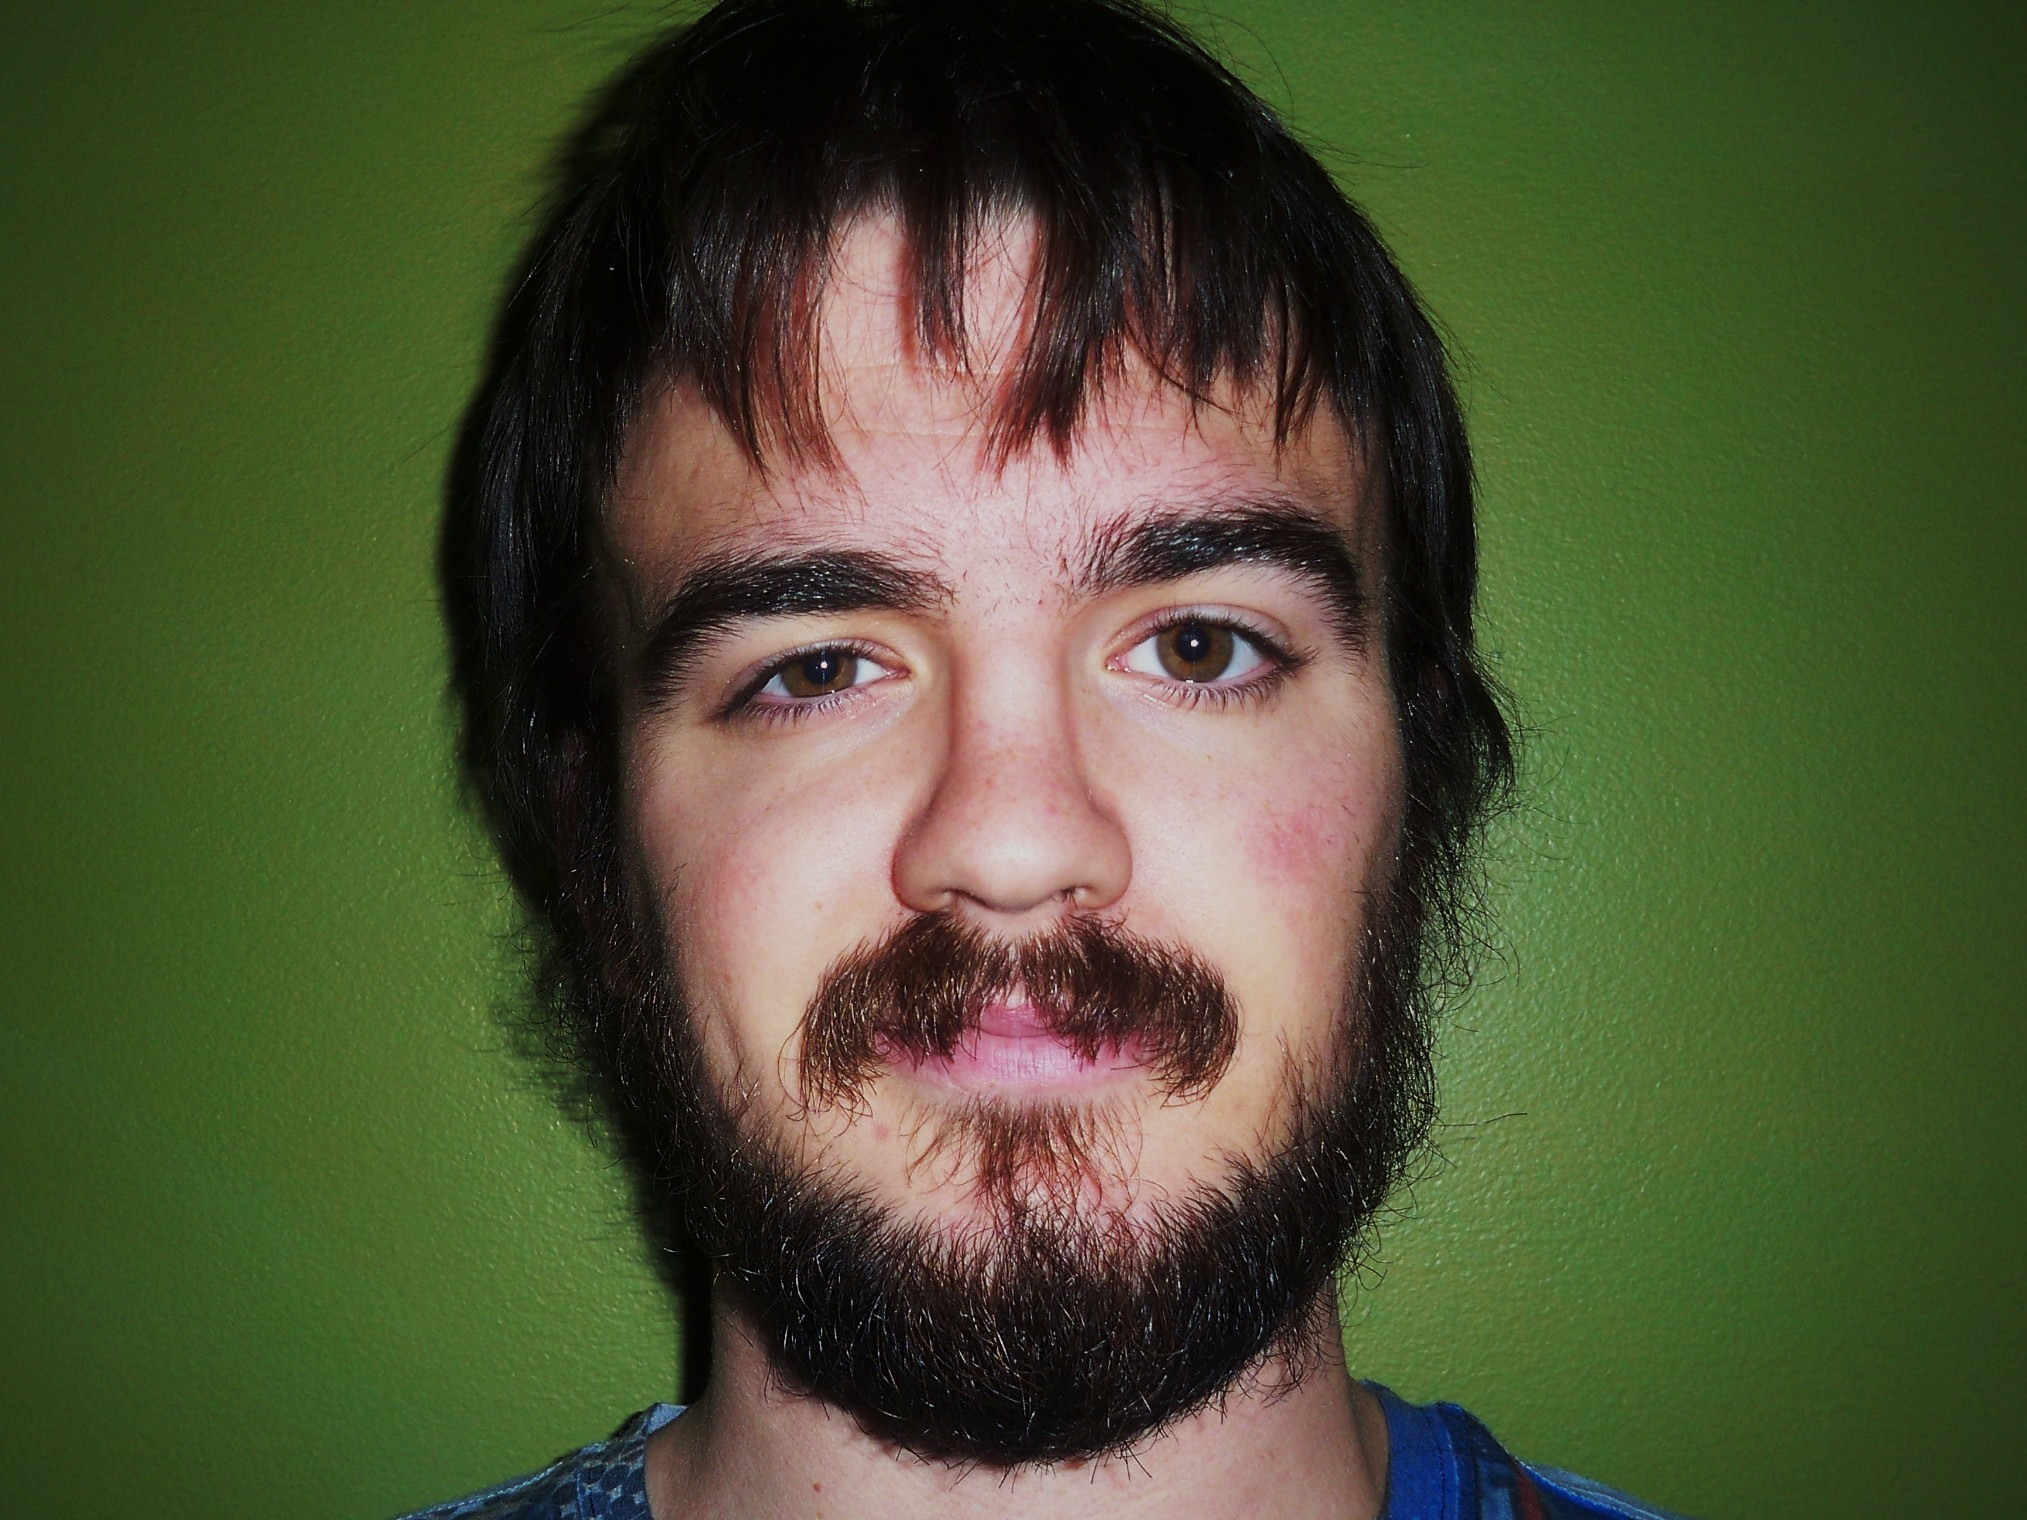 zappa beard - photo #9